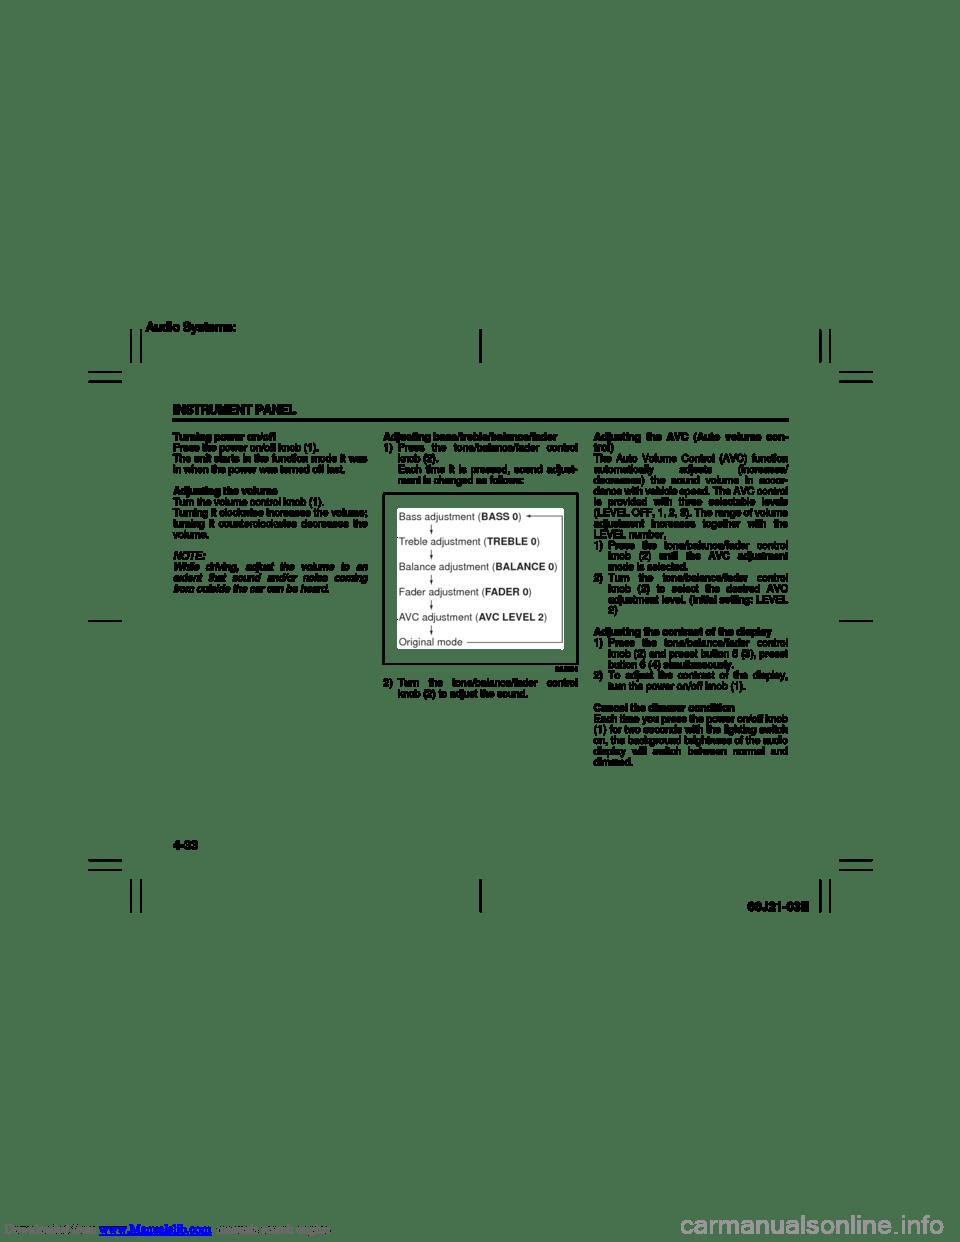 SUZUKI GRAND VITARA 2007 3.G Owners Manual